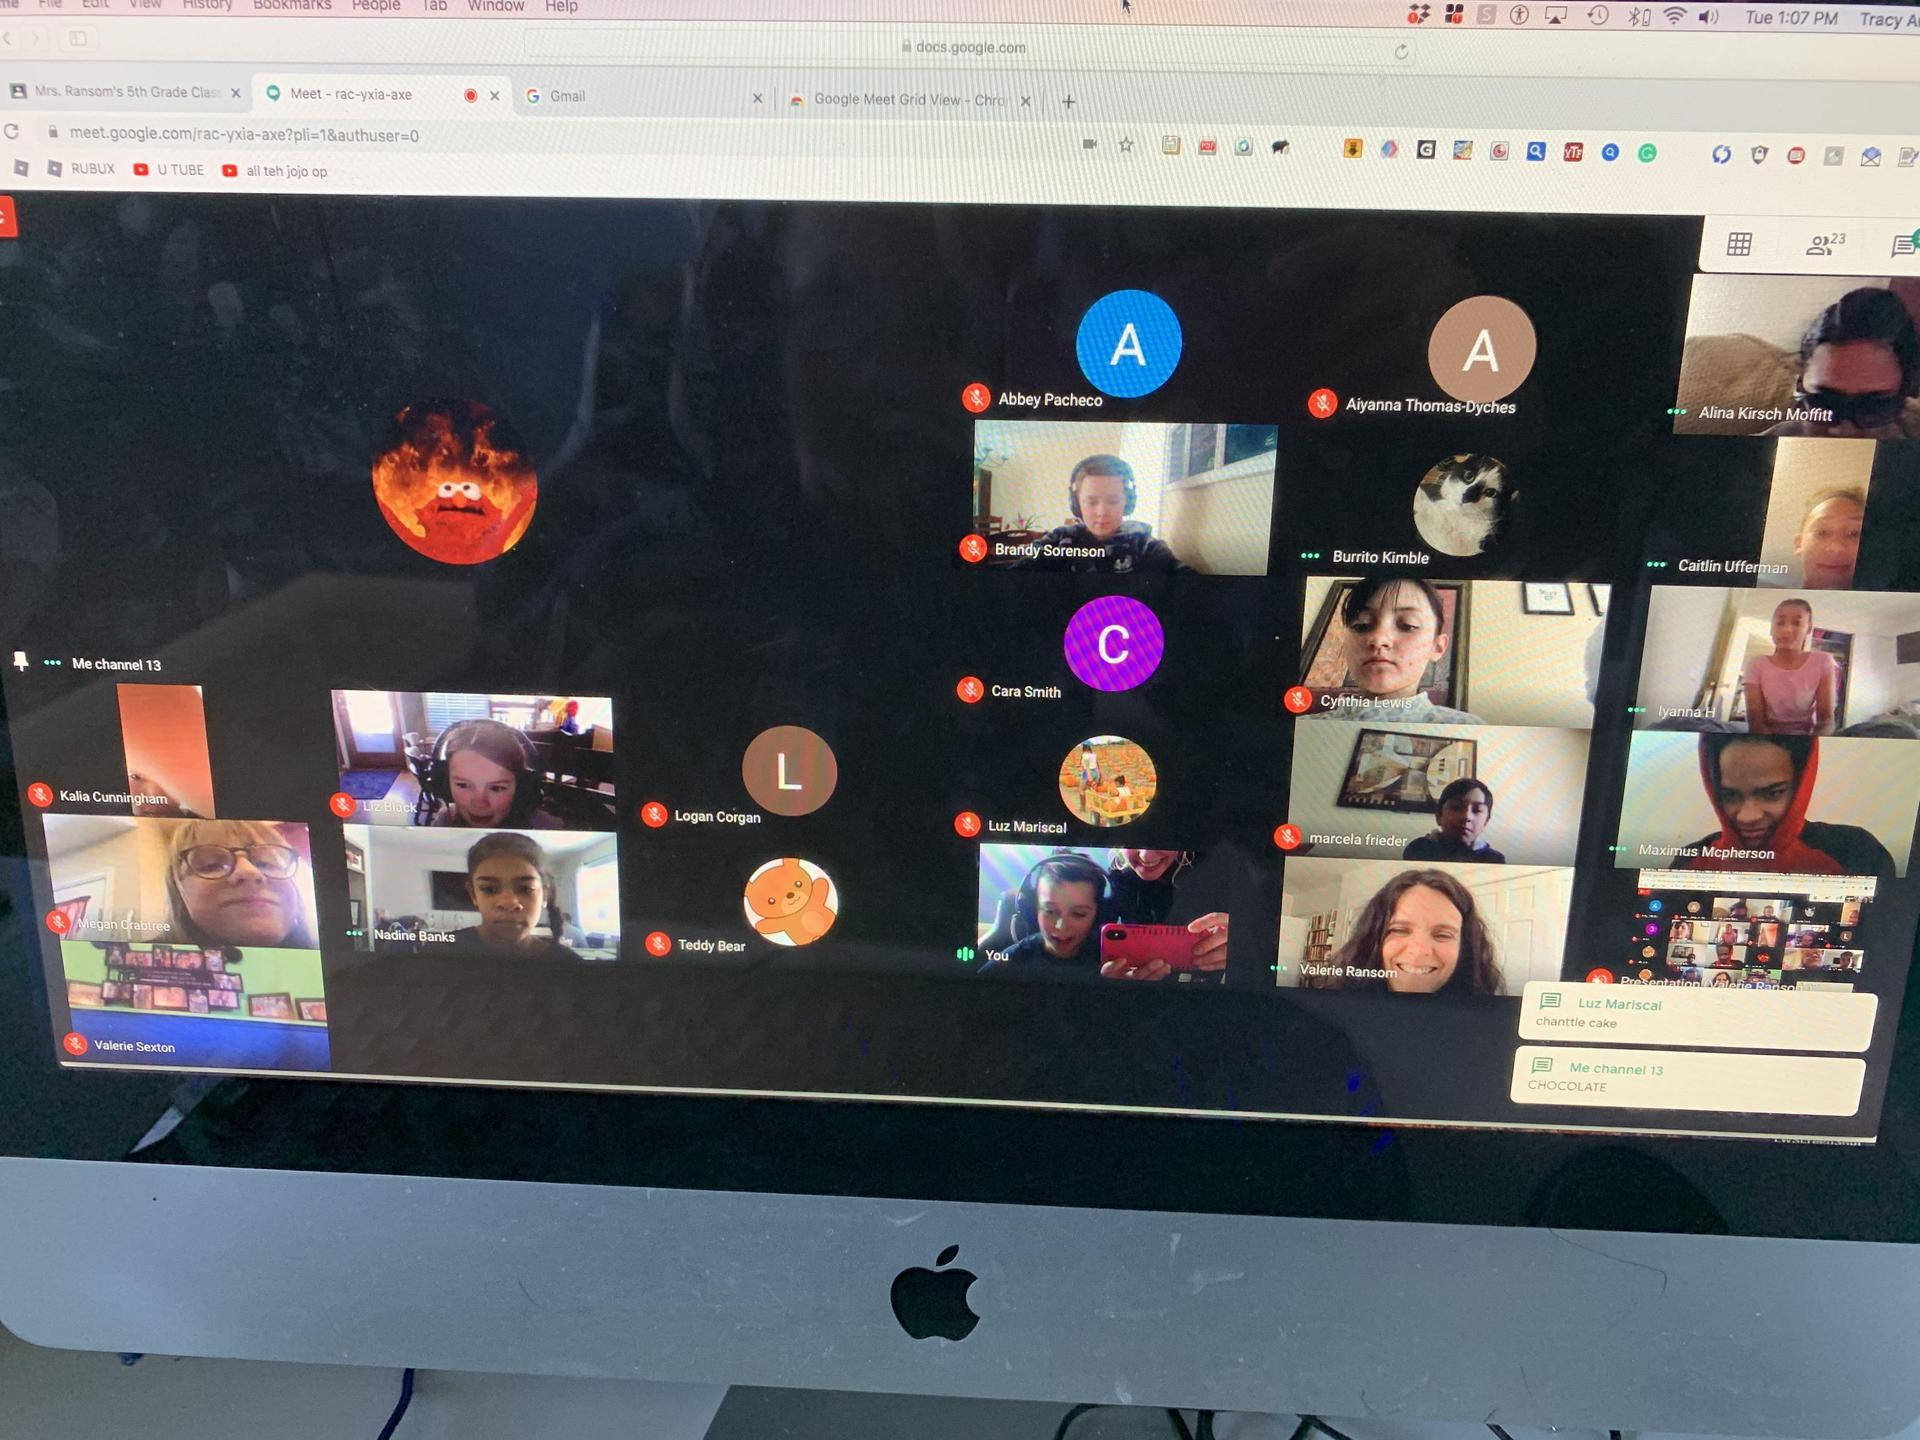 Group on webcam